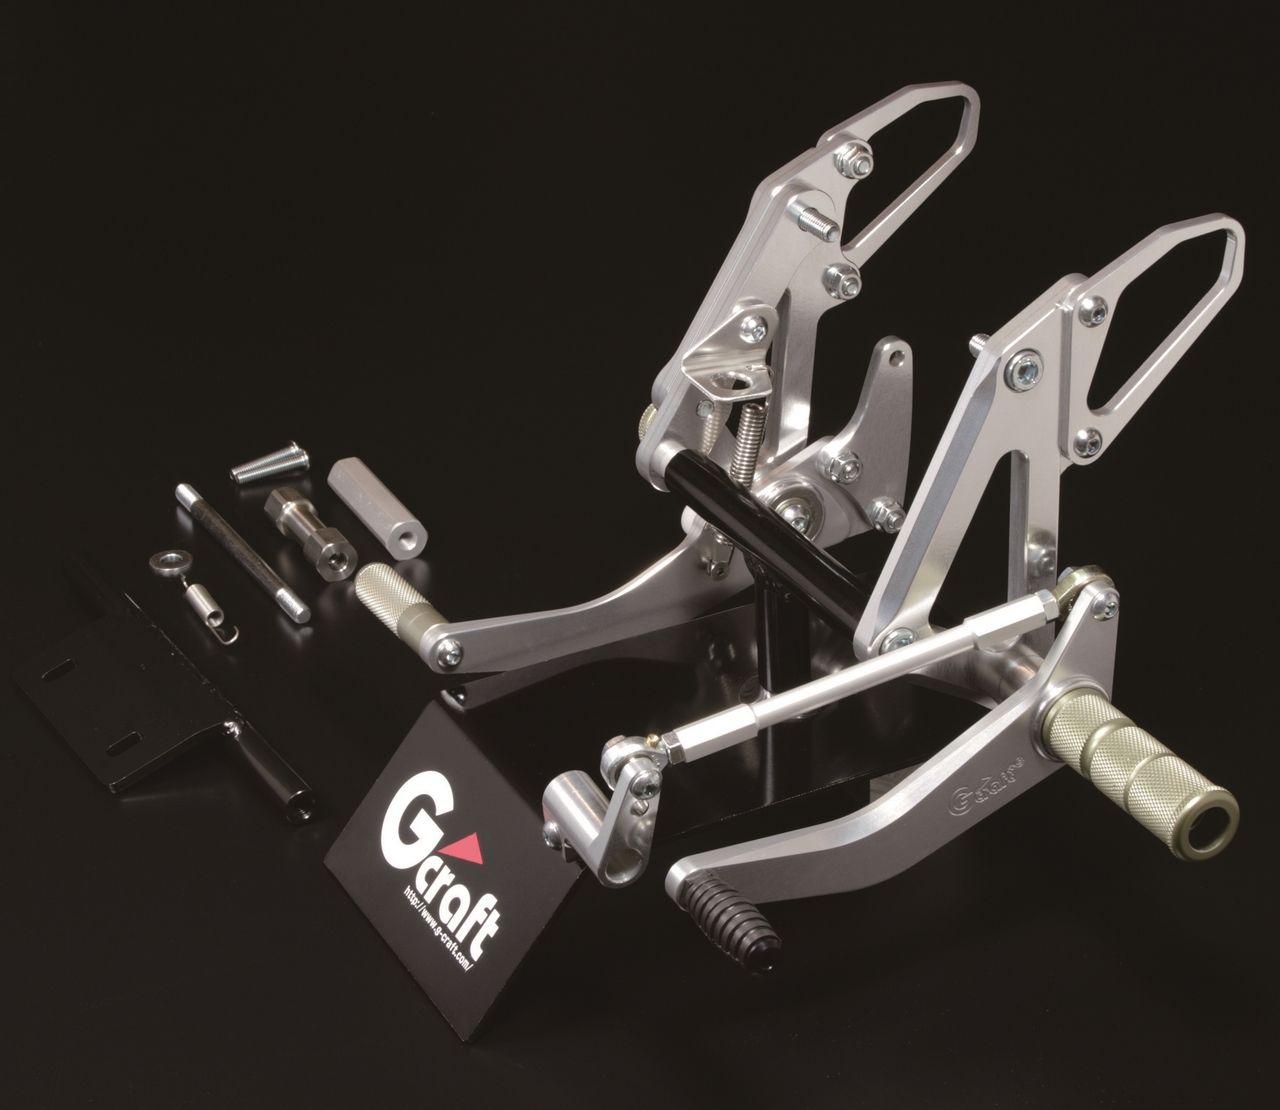 MONKEY專用+e腳踏後移套件 (鼓式煞車碟式煞車通用)